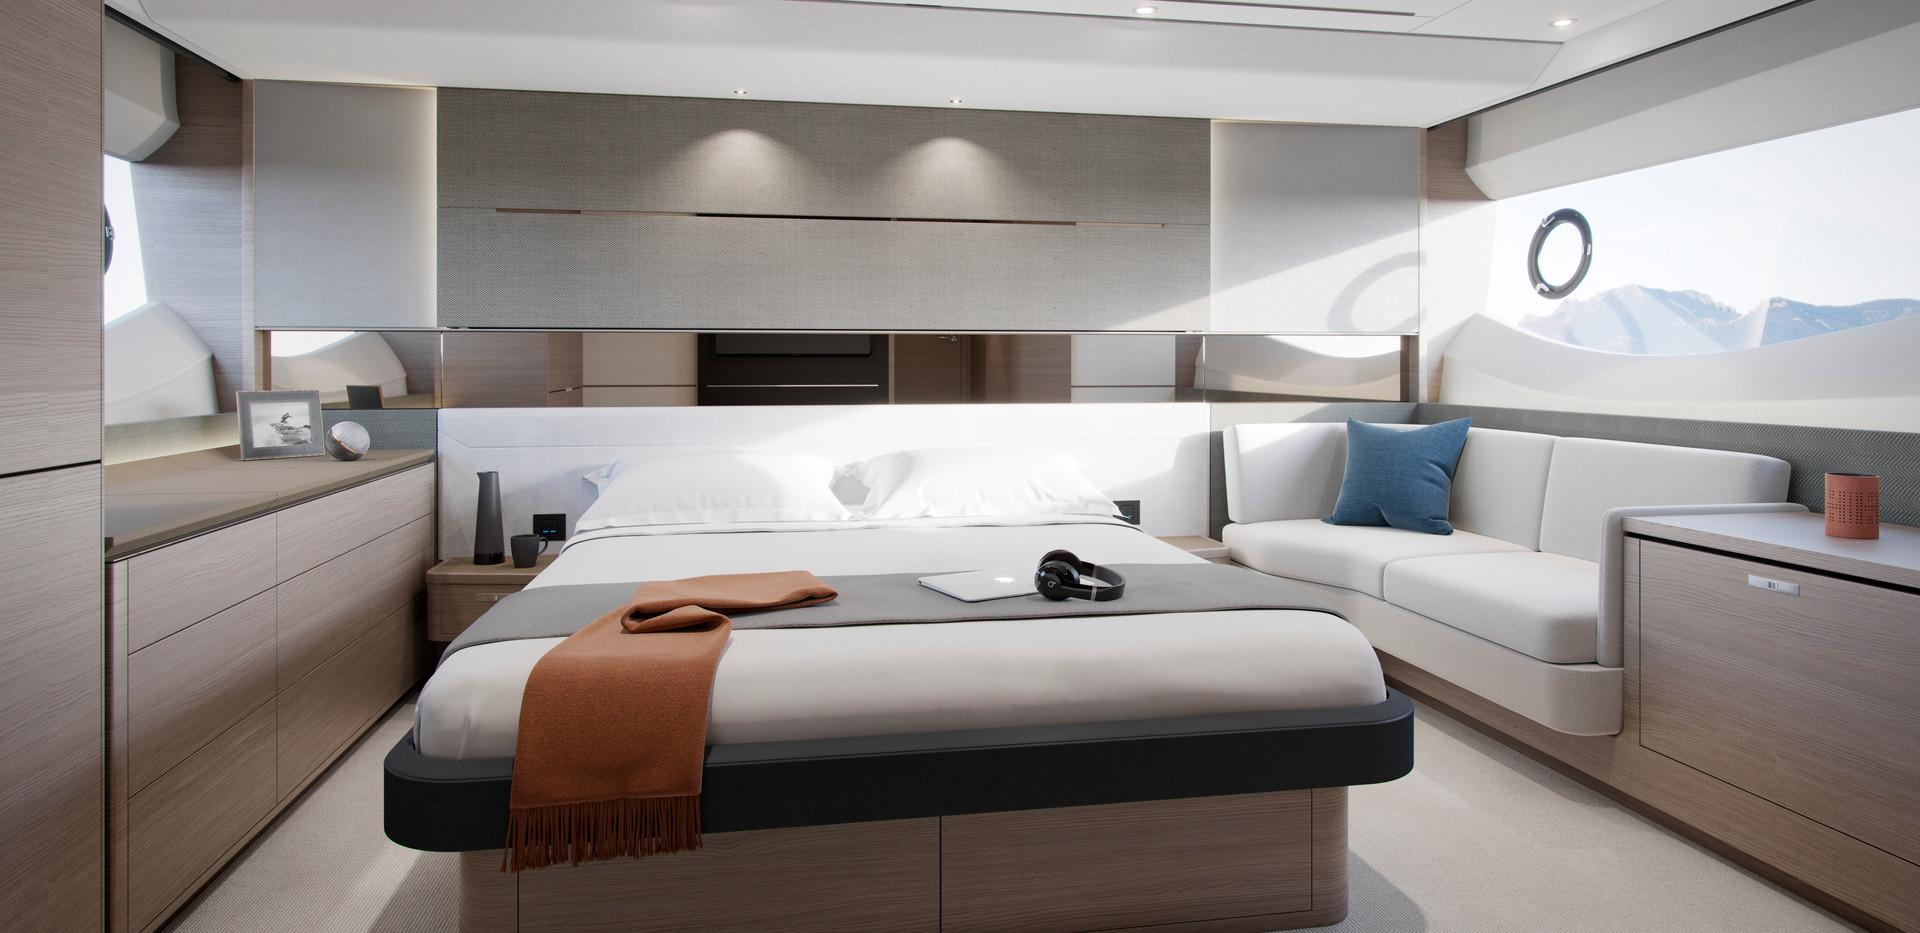 s62-interior-owners-stateroom-cgi.jpg